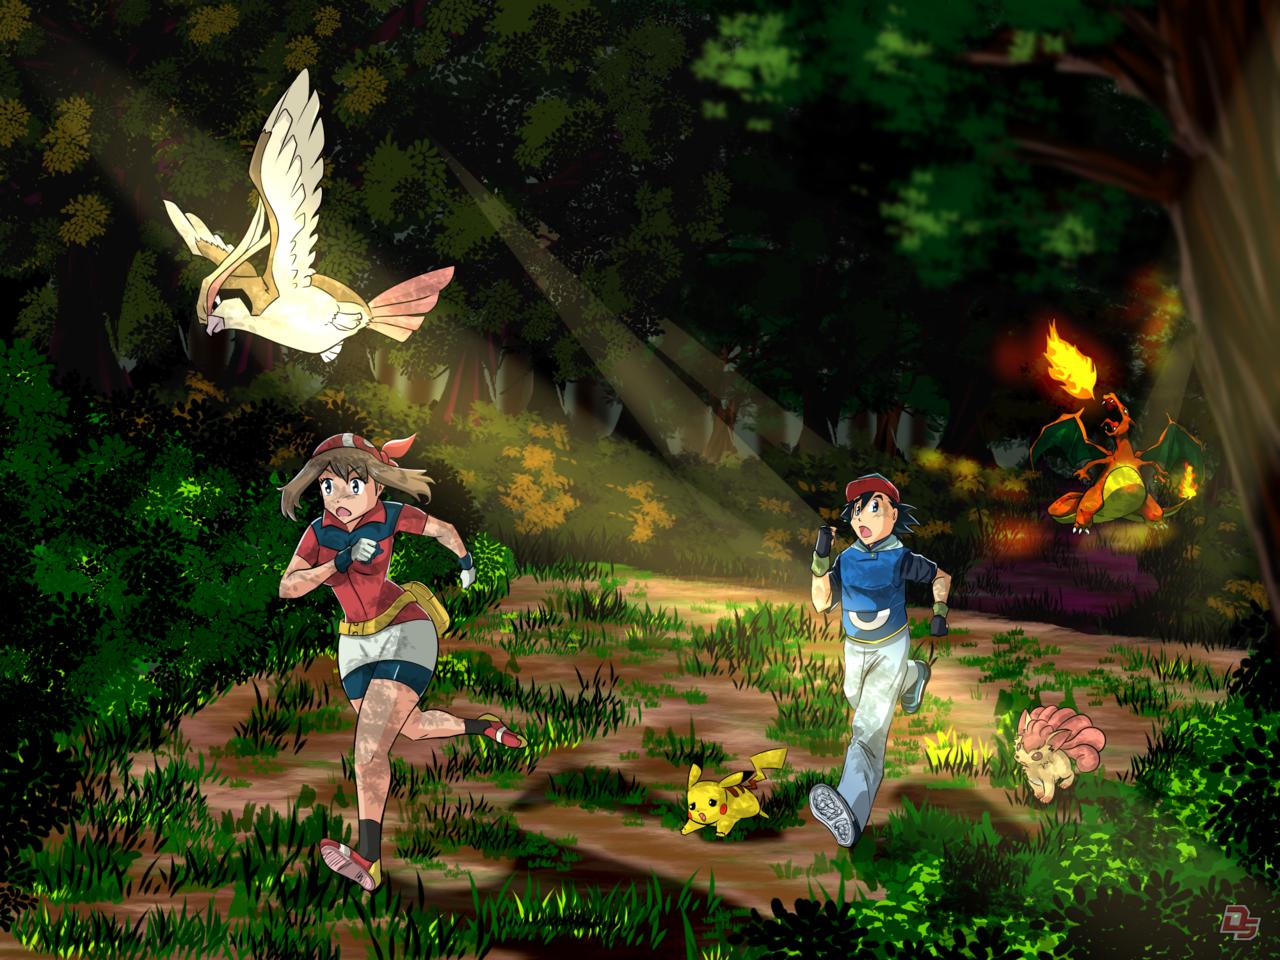 Pokémon Illust of Diego-SSA adventure pokemon anime mangaart kawaii PokémonGO background